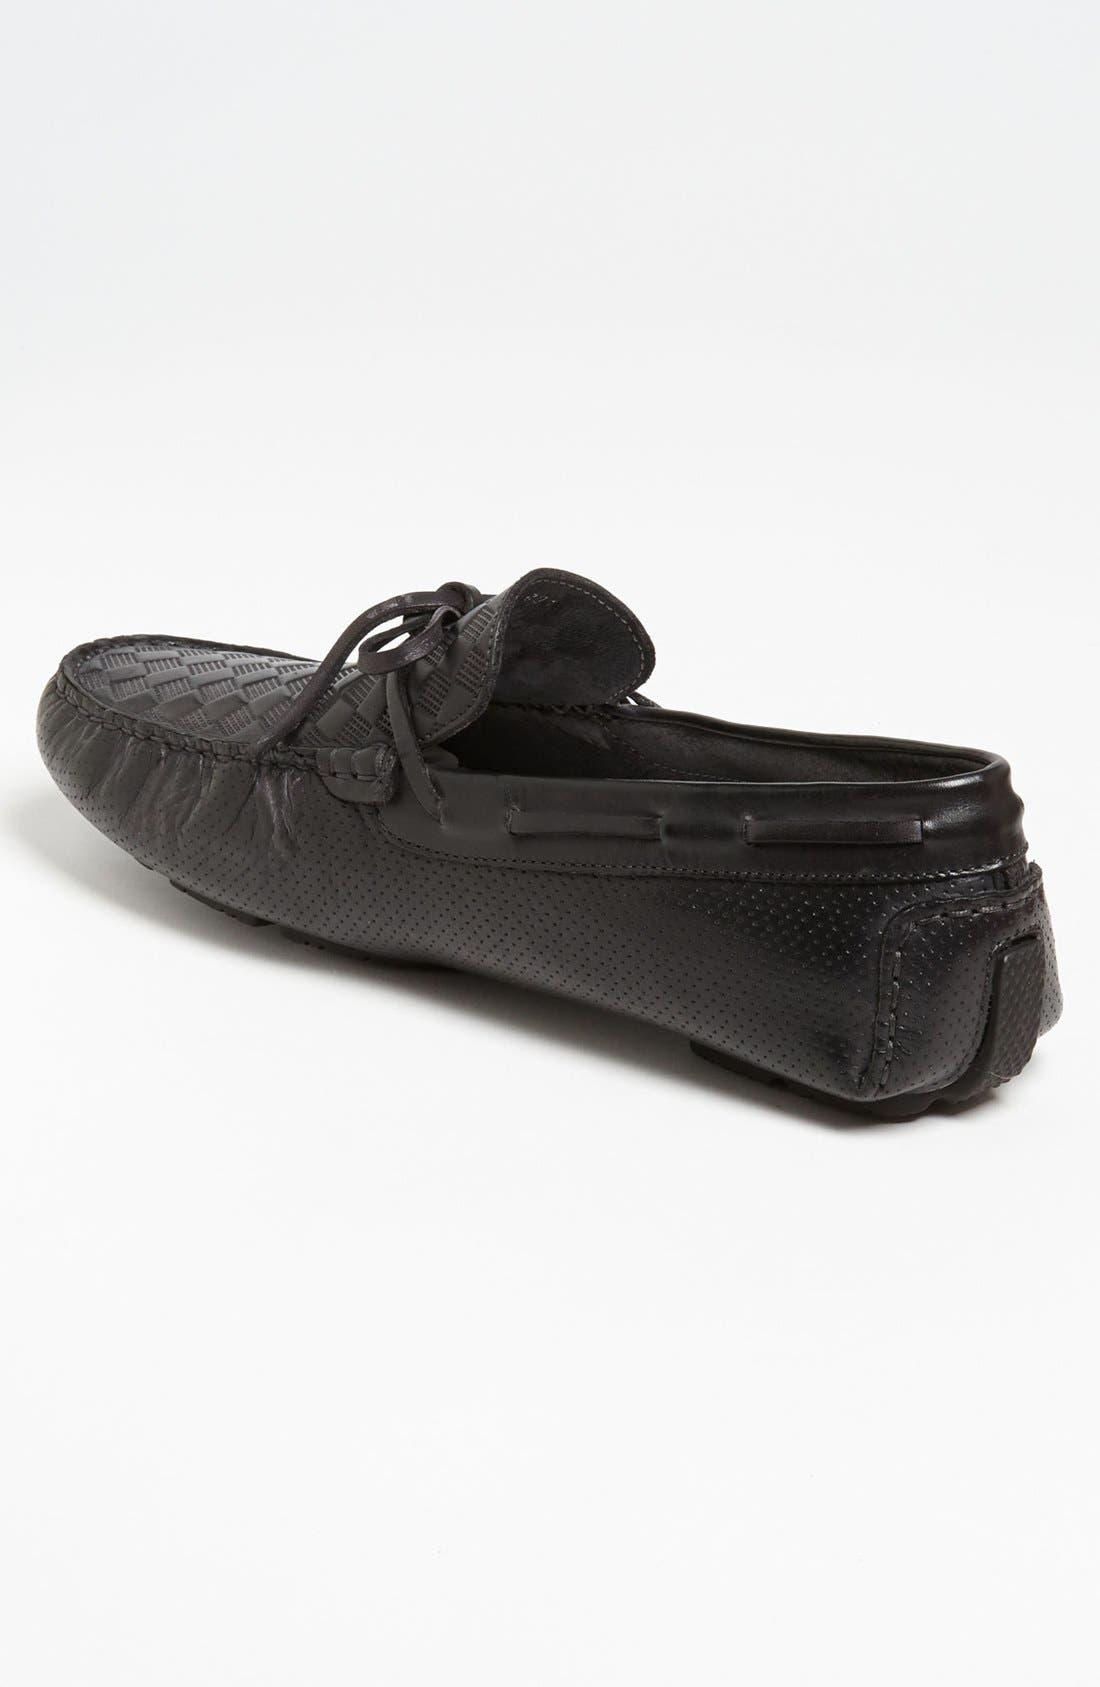 Alternate Image 2  - Bacco Bucci 'Balotelli' Driving Shoe (Men)